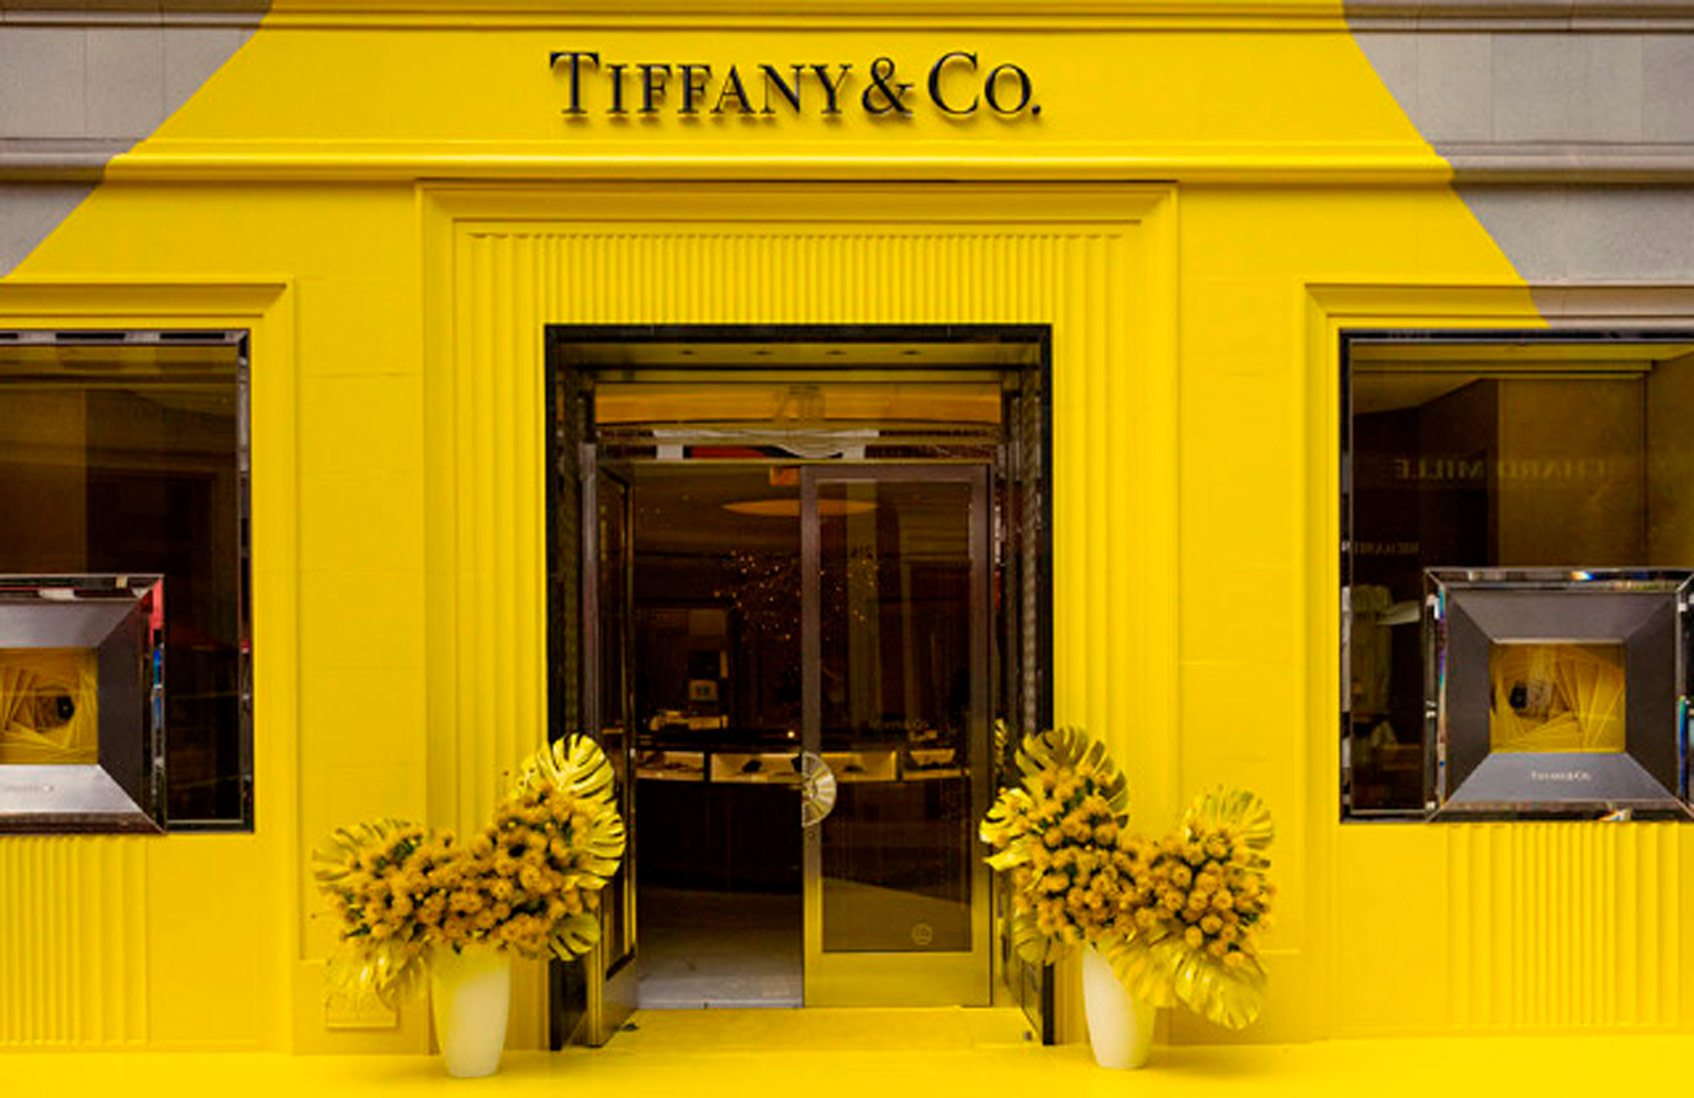 Бутик Tiffany & Co. в Беверли-Хиллз сменил цвет на ярко-желтый